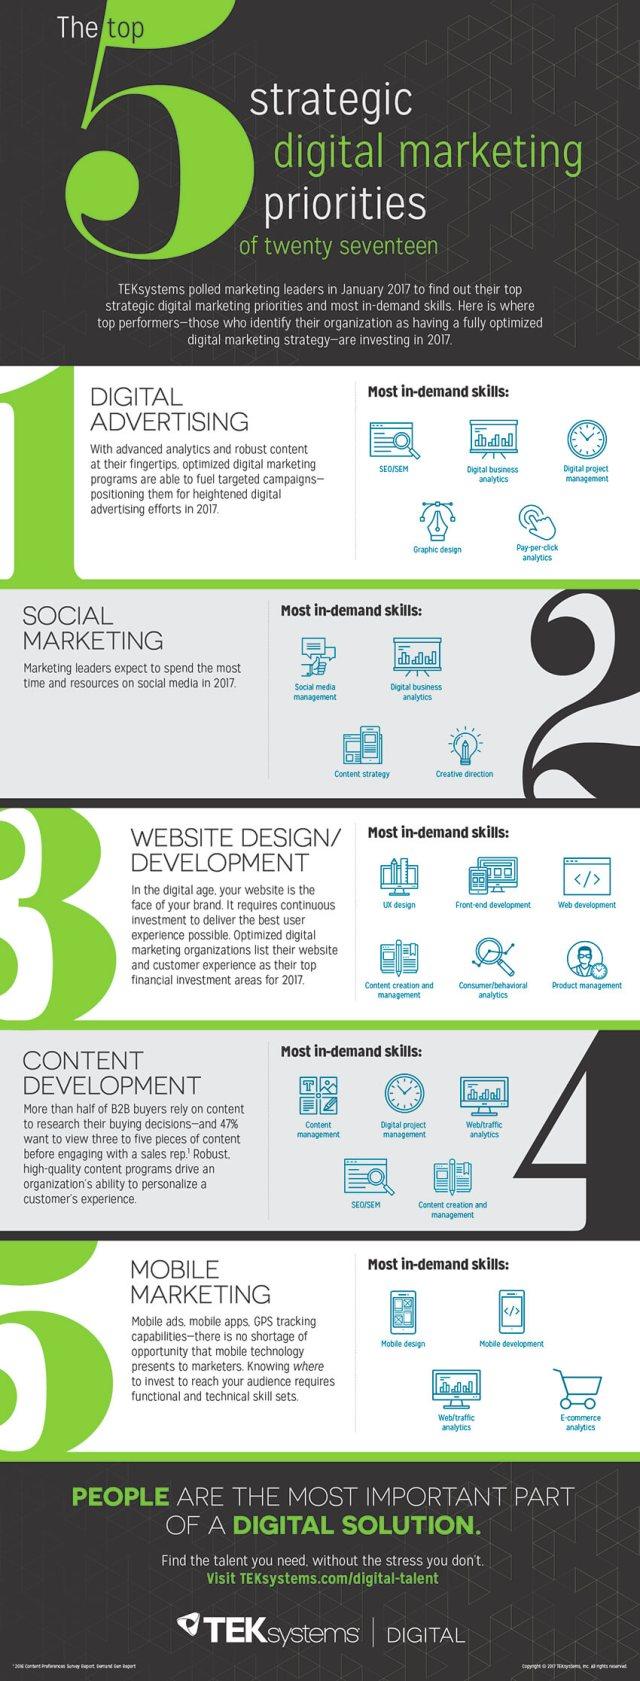 Strategic Digital Marketing Priorities Infographic compressed.jpg